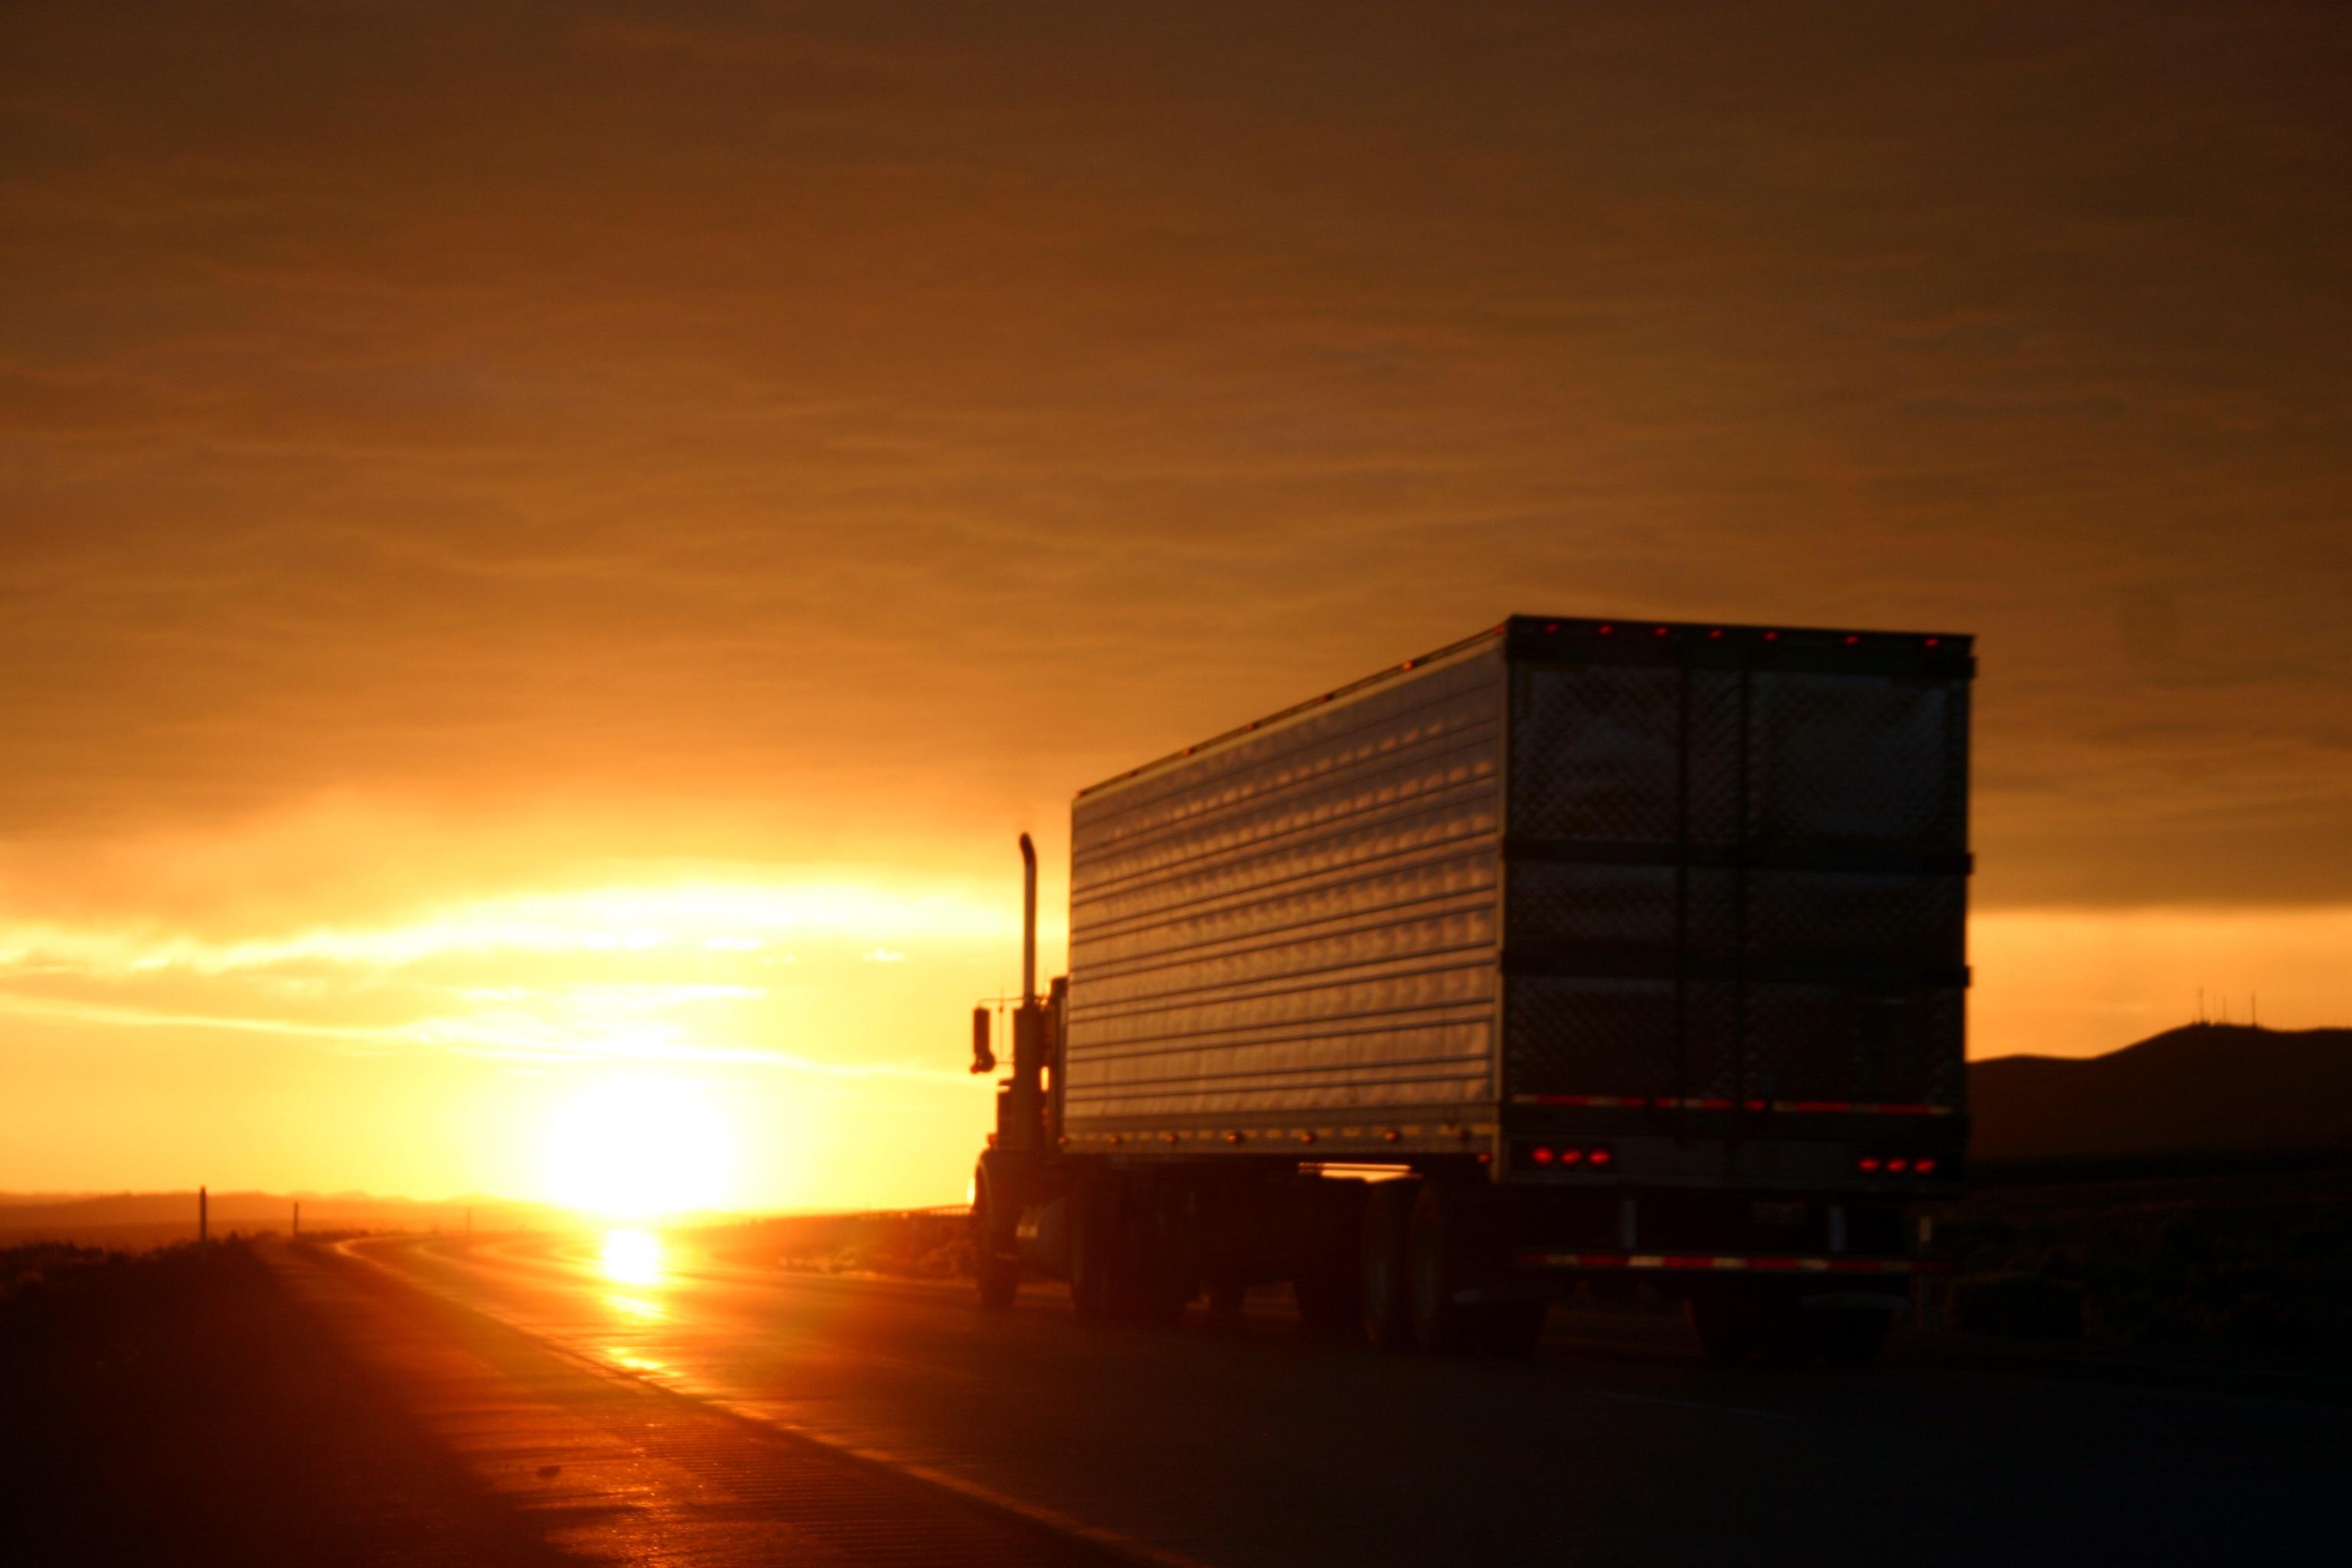 bigstock-Truck-Sunset-1238291.jpg